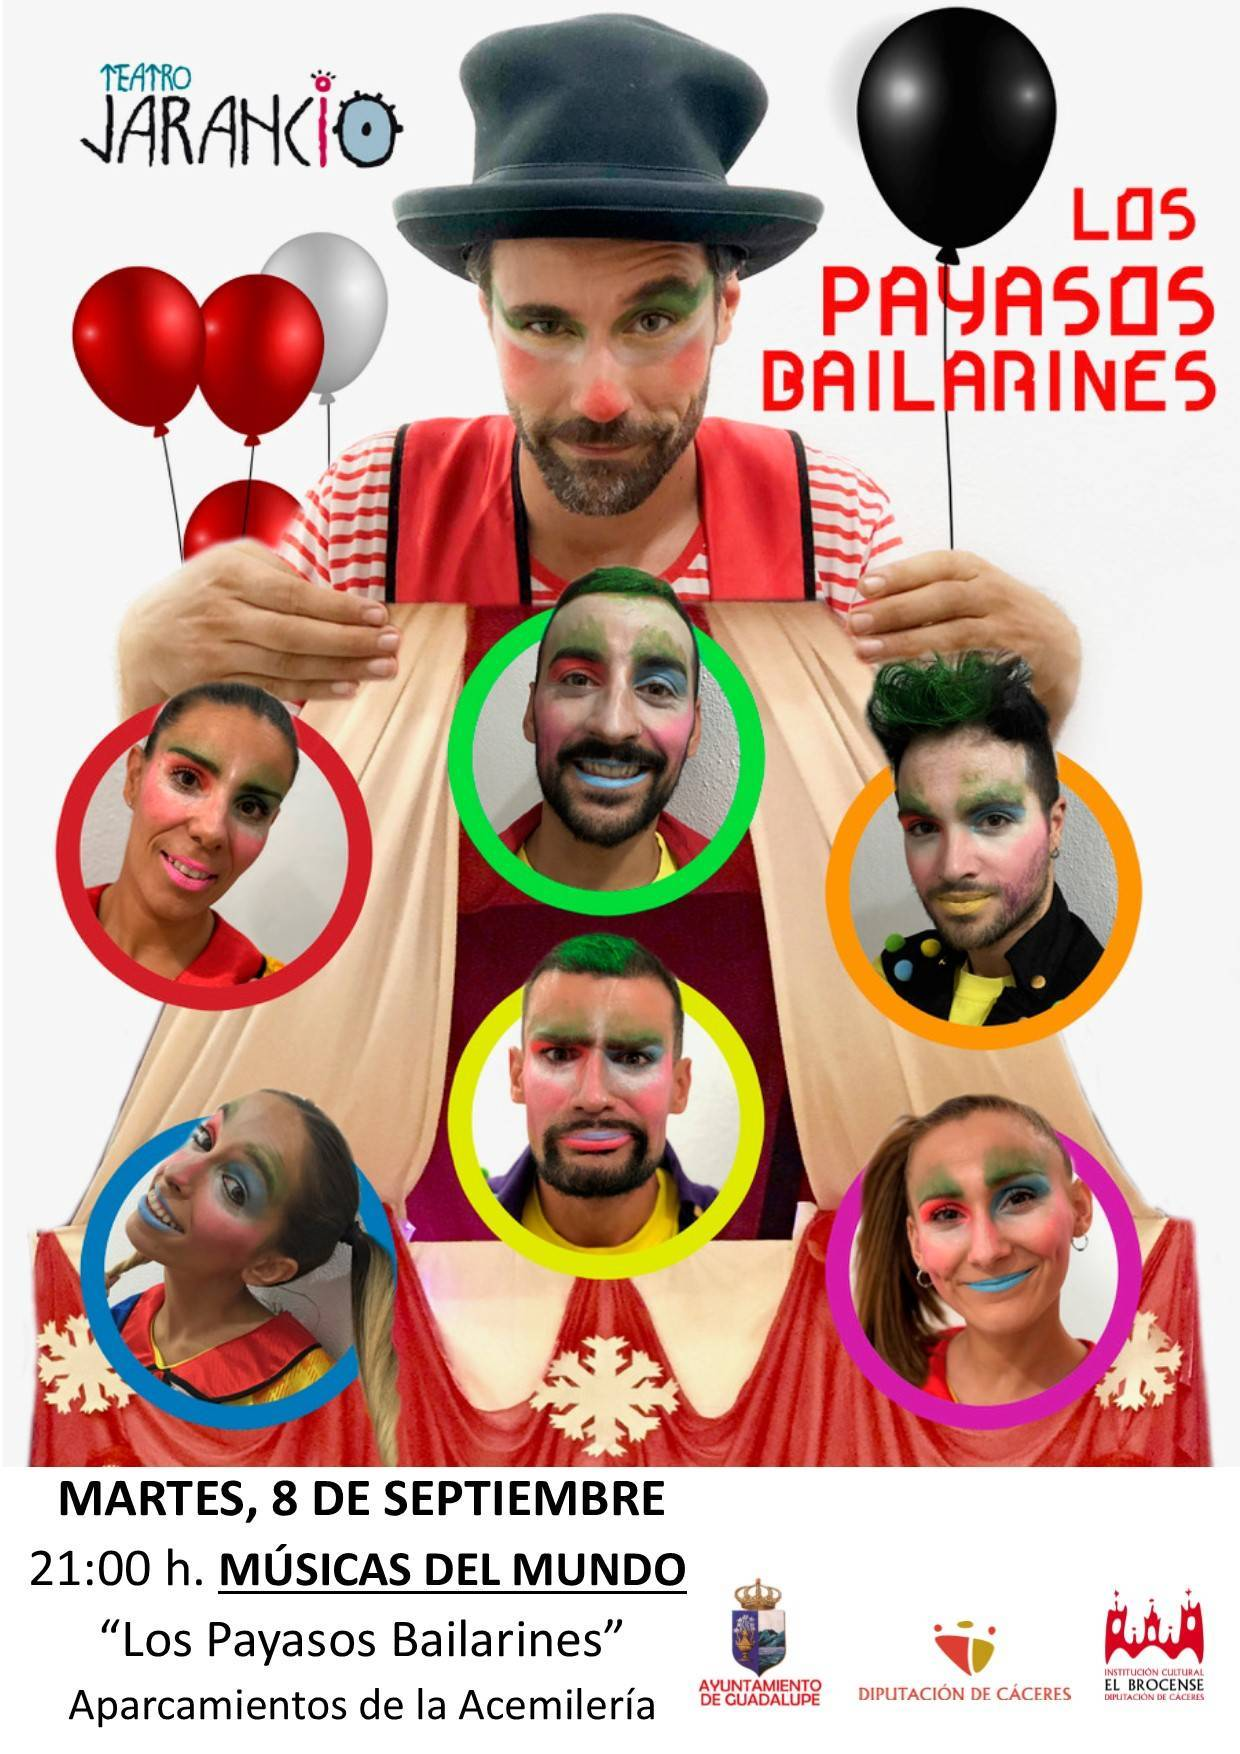 Los payasos bailarines (2020) - Guadalupe (Cáceres)